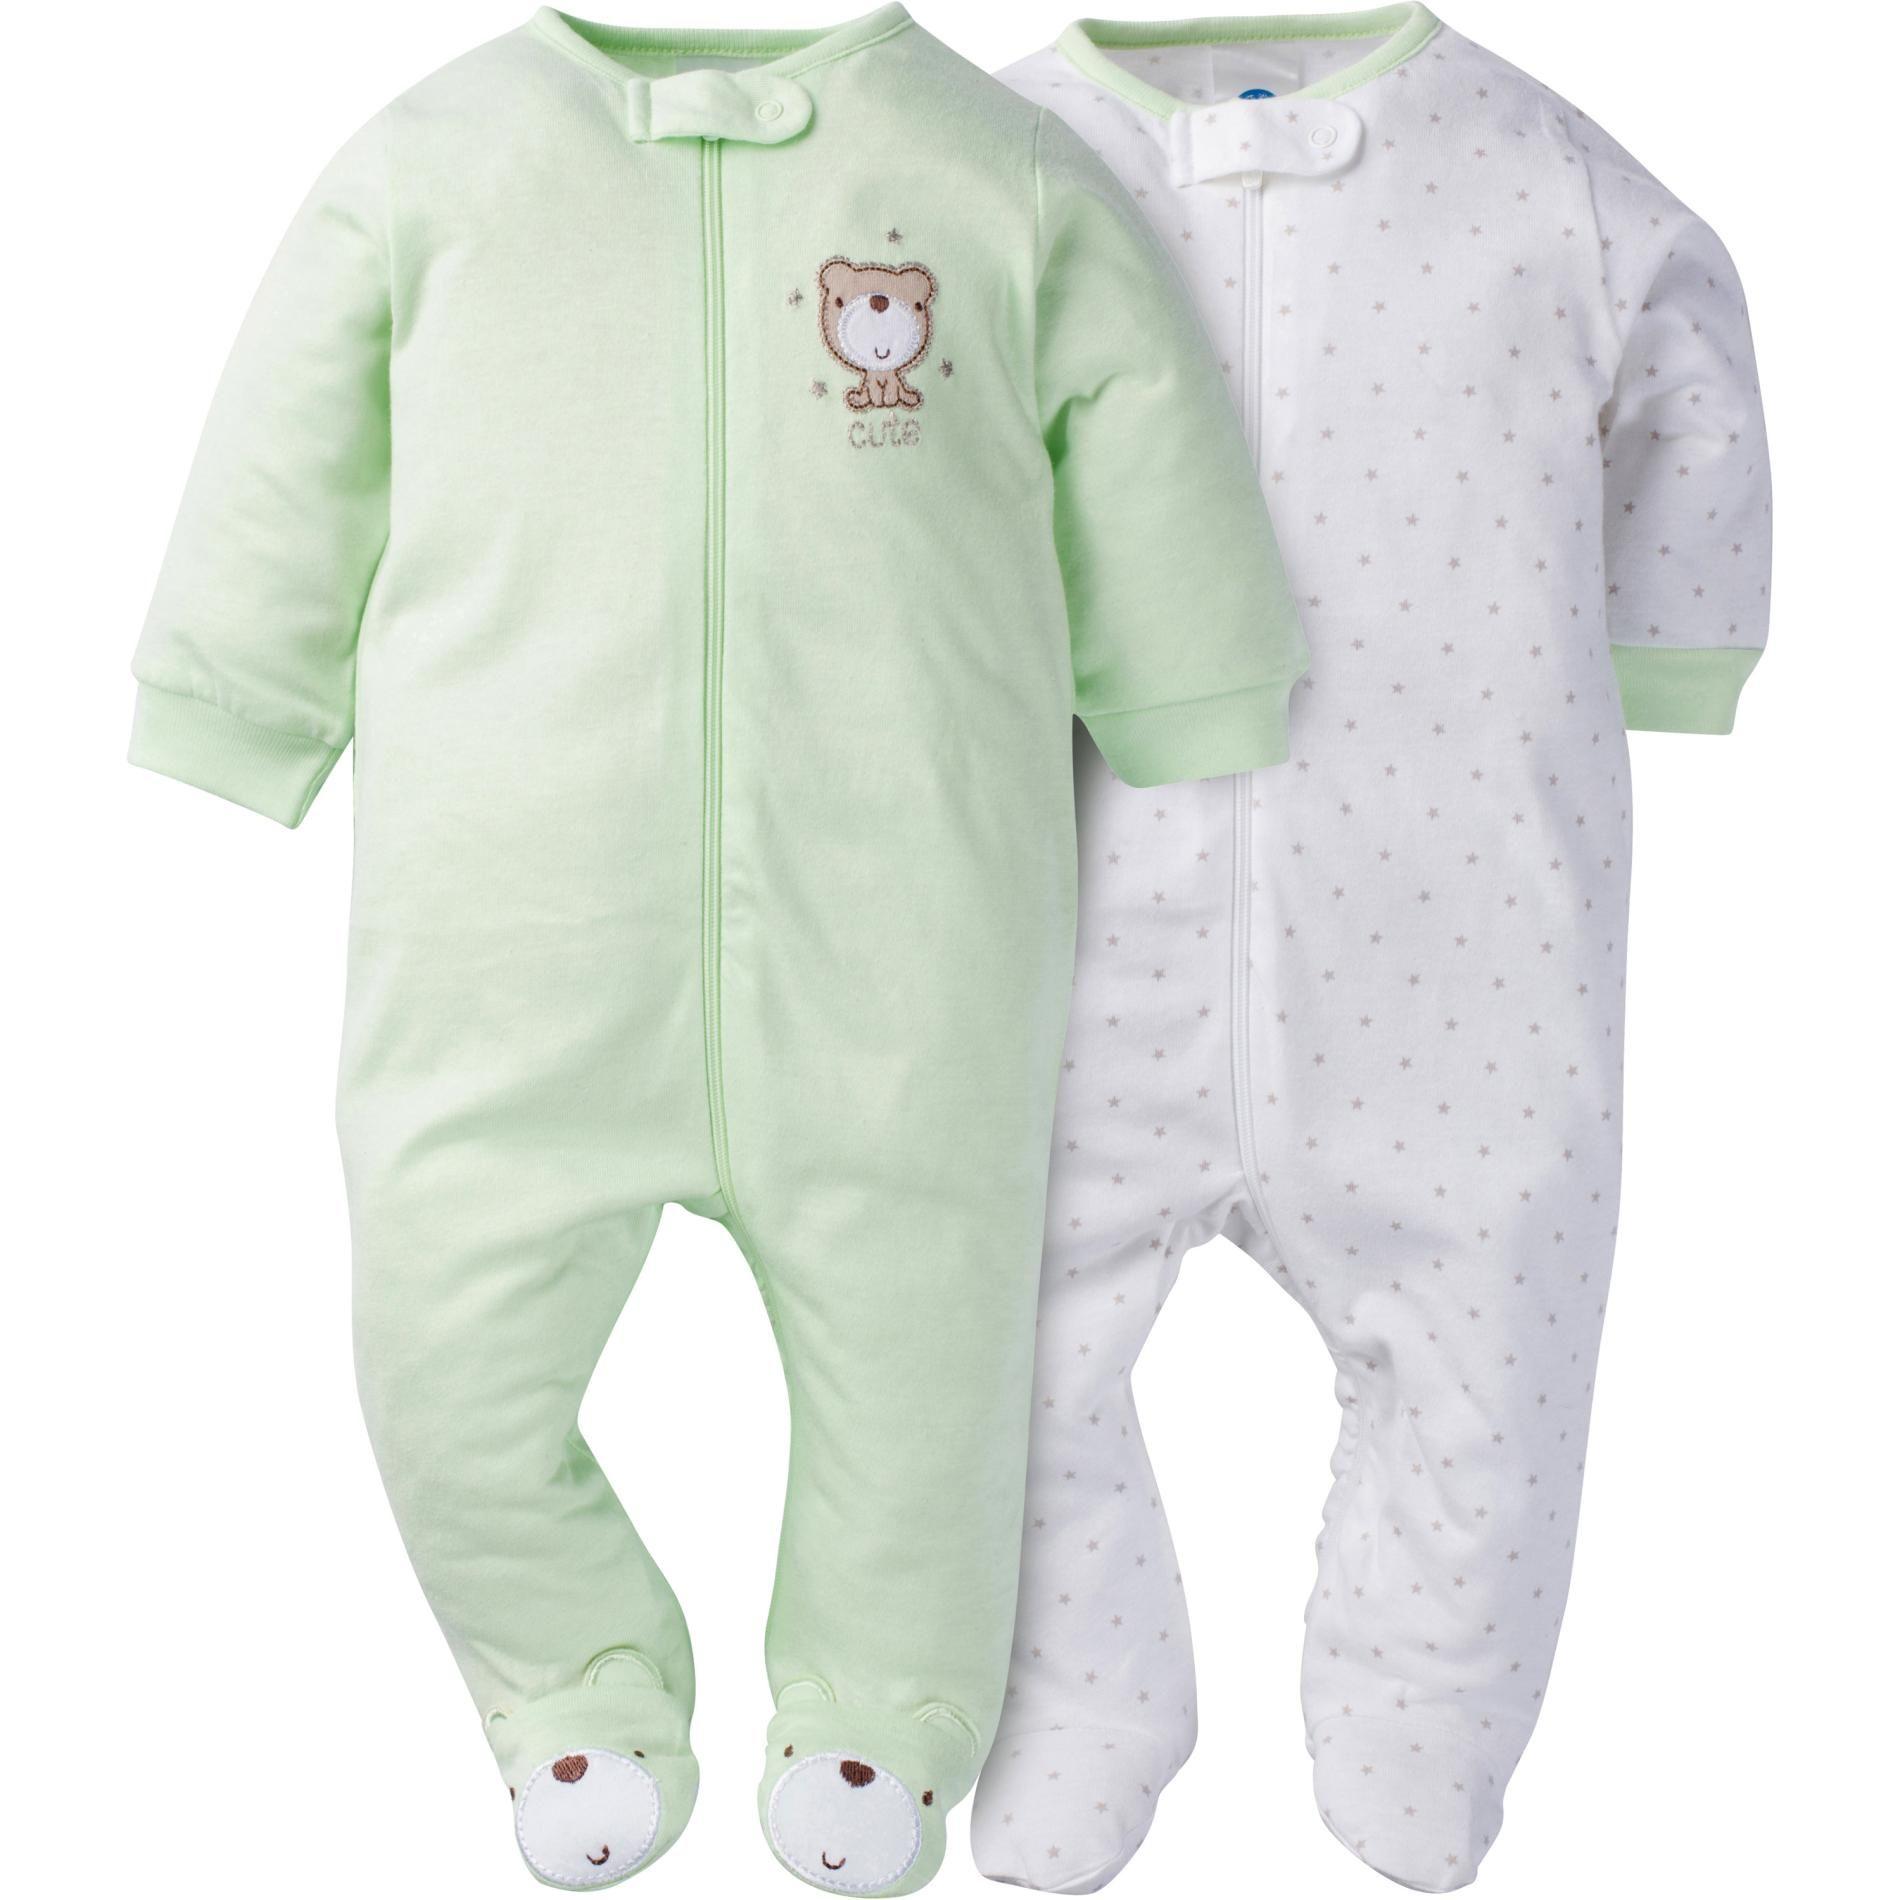 2fff8158aaef Gerber Newborn s 2-Pack Sleeper Pajamas - Bears   Dots